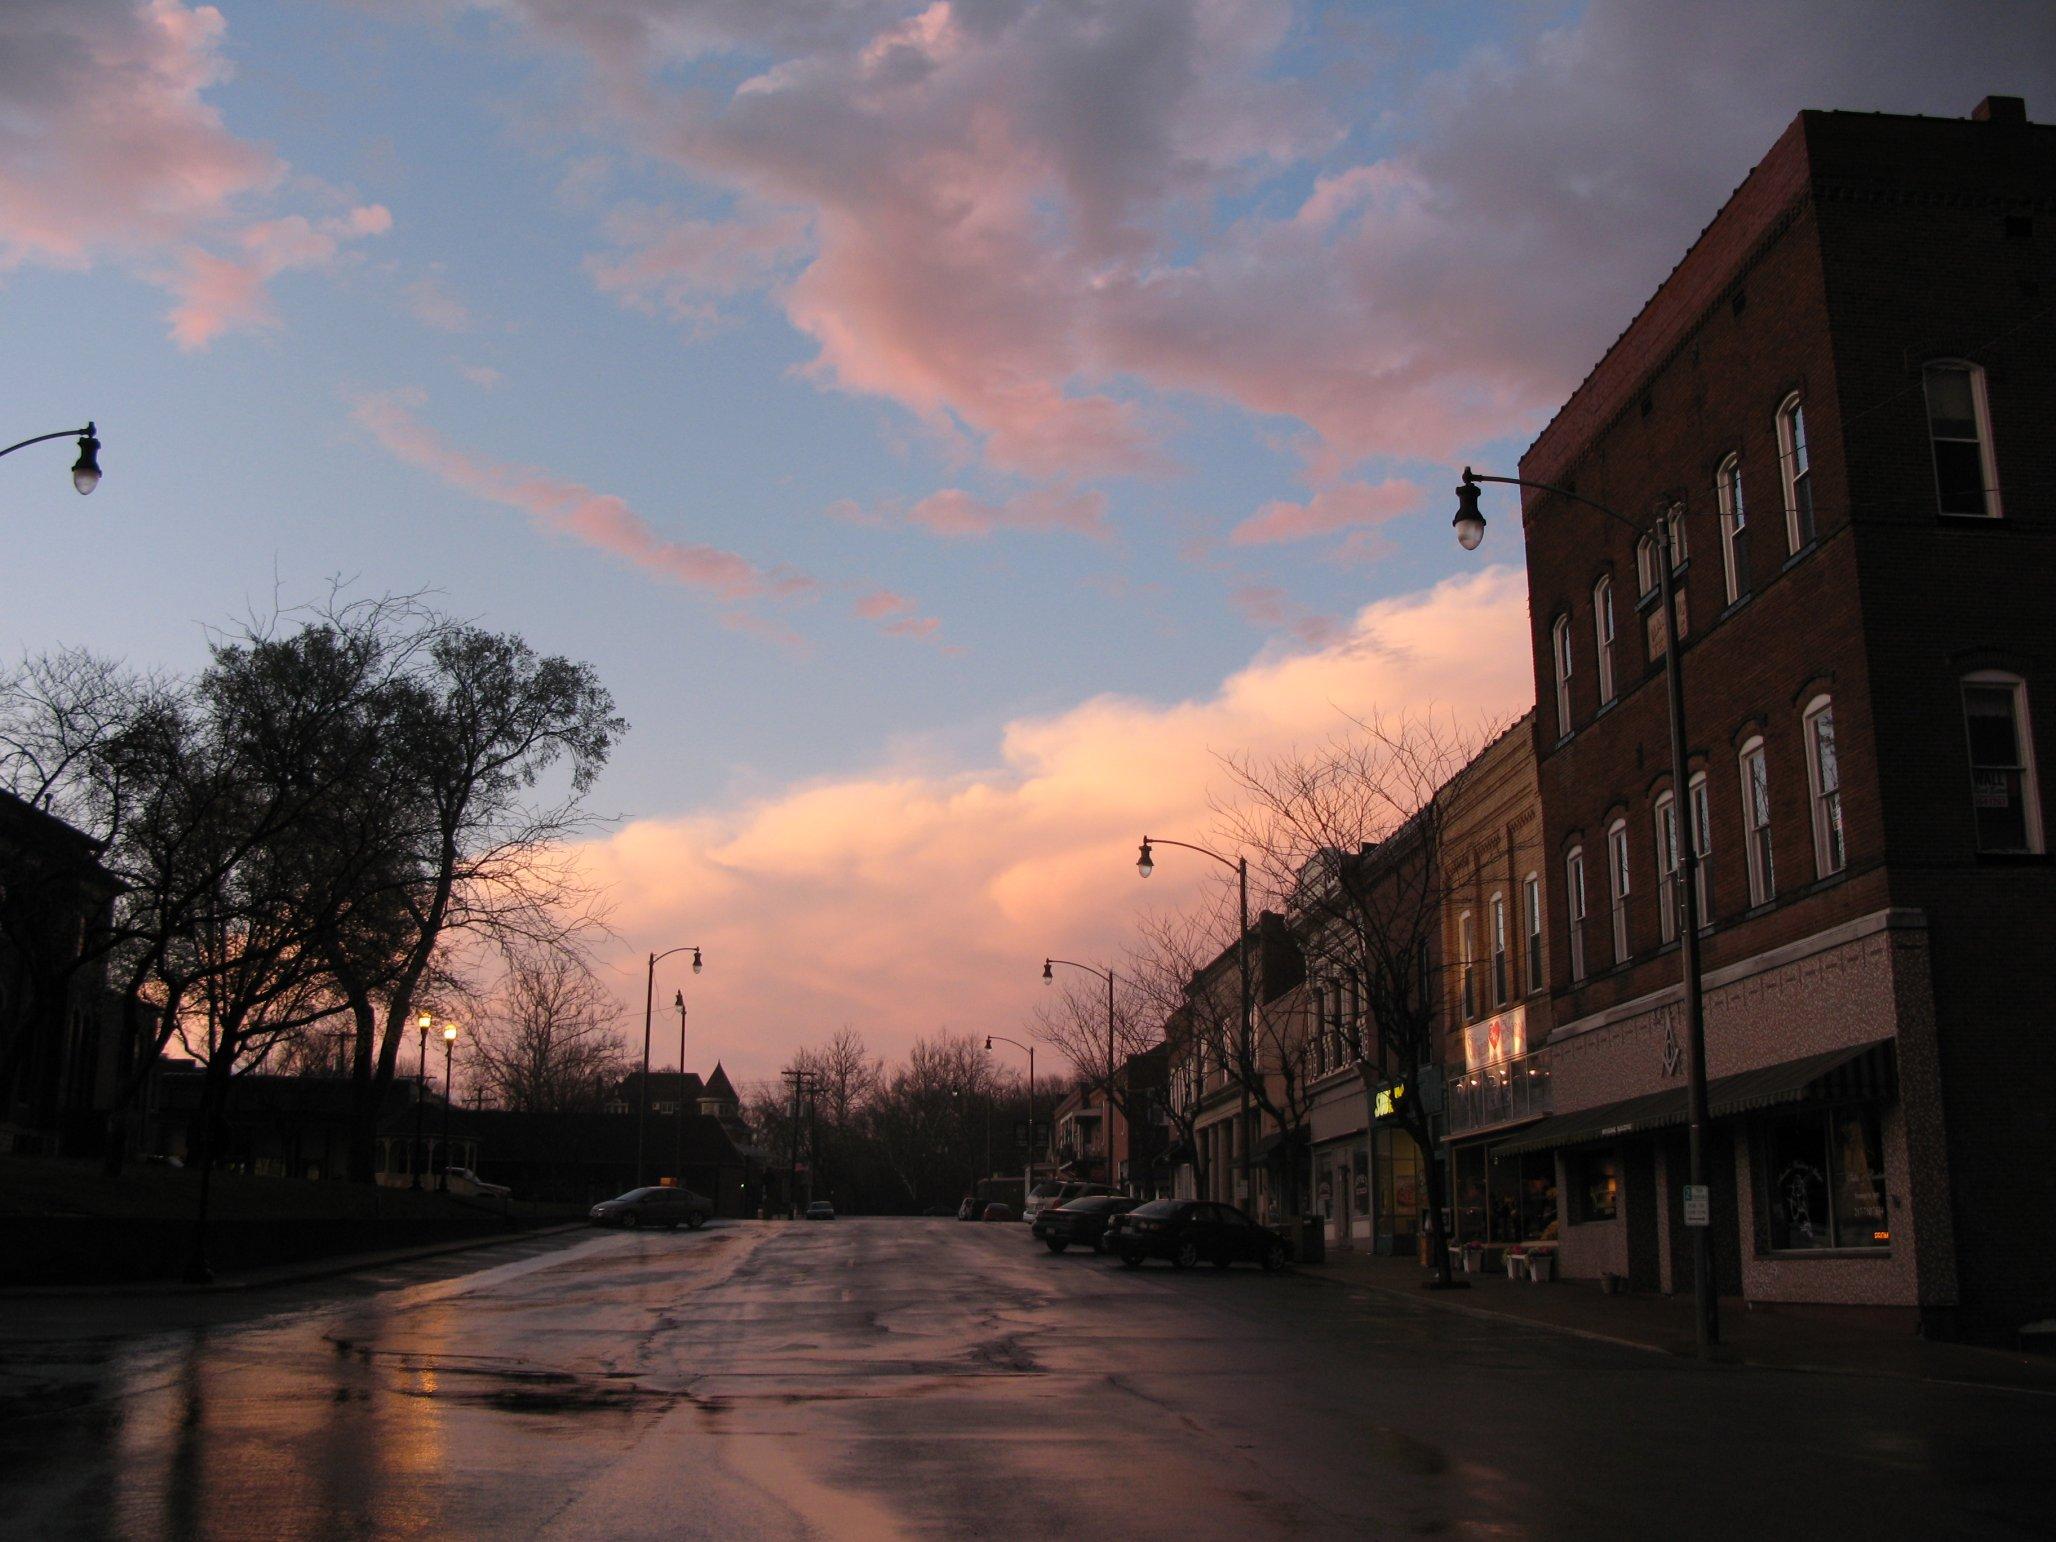 Downtown Greenville Illinois